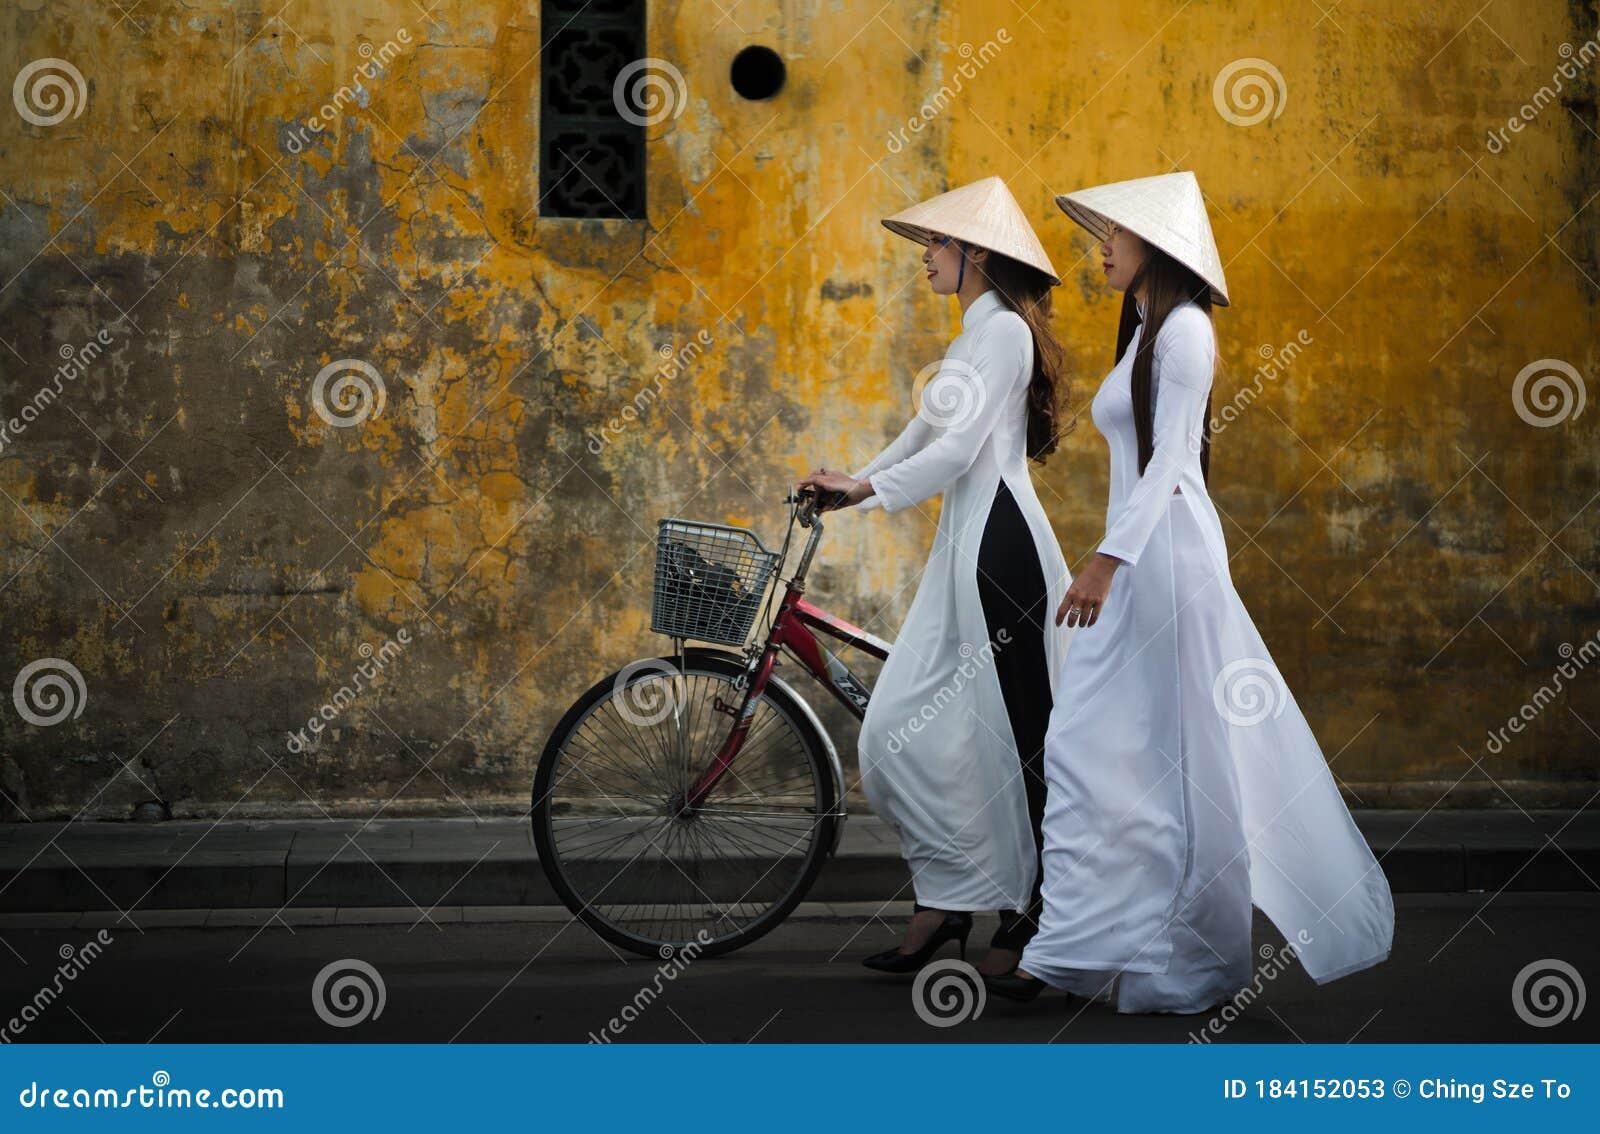 Of women pictures vietnamese American Rape